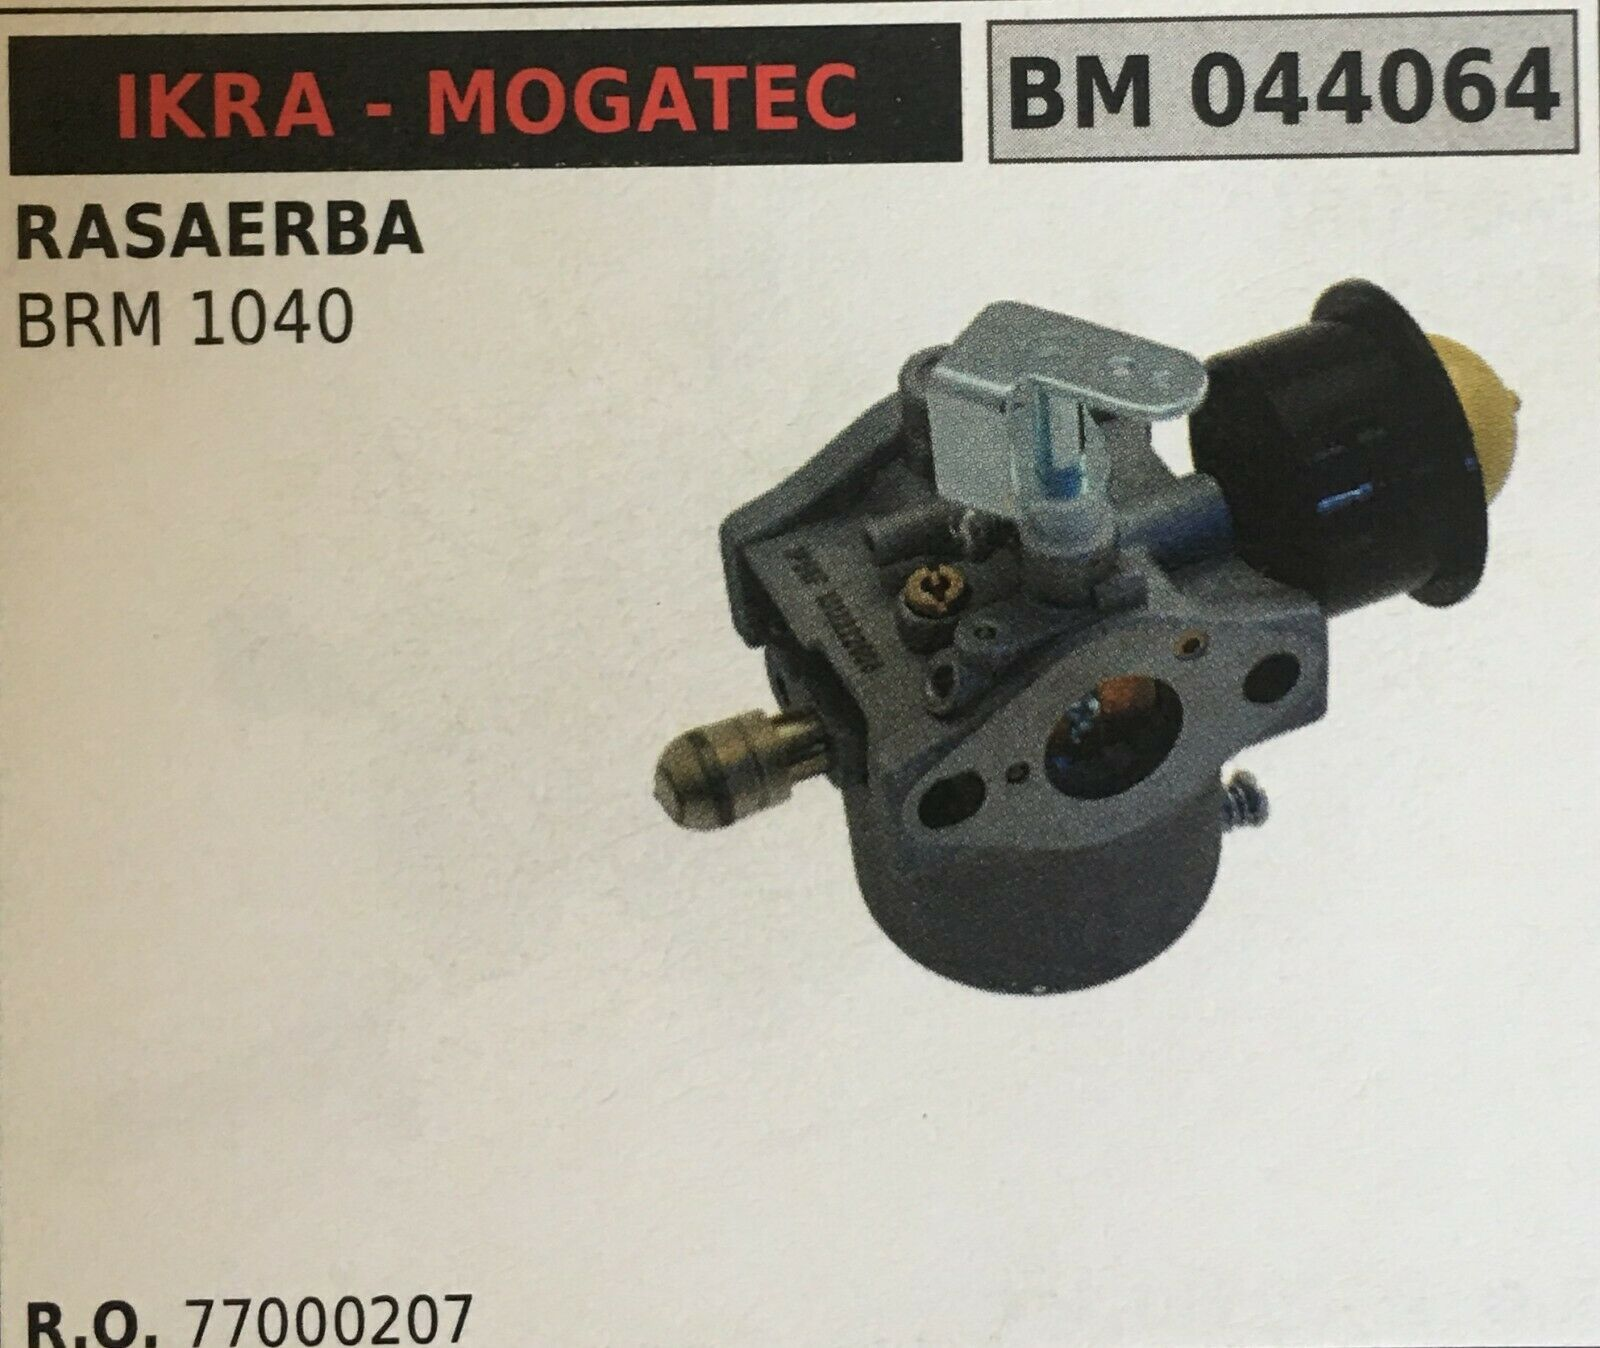 CocheBURATORE A VASCHETTA BRUMAR IKRA - MOGATEC BM044064 RASAERBA BRM 1040